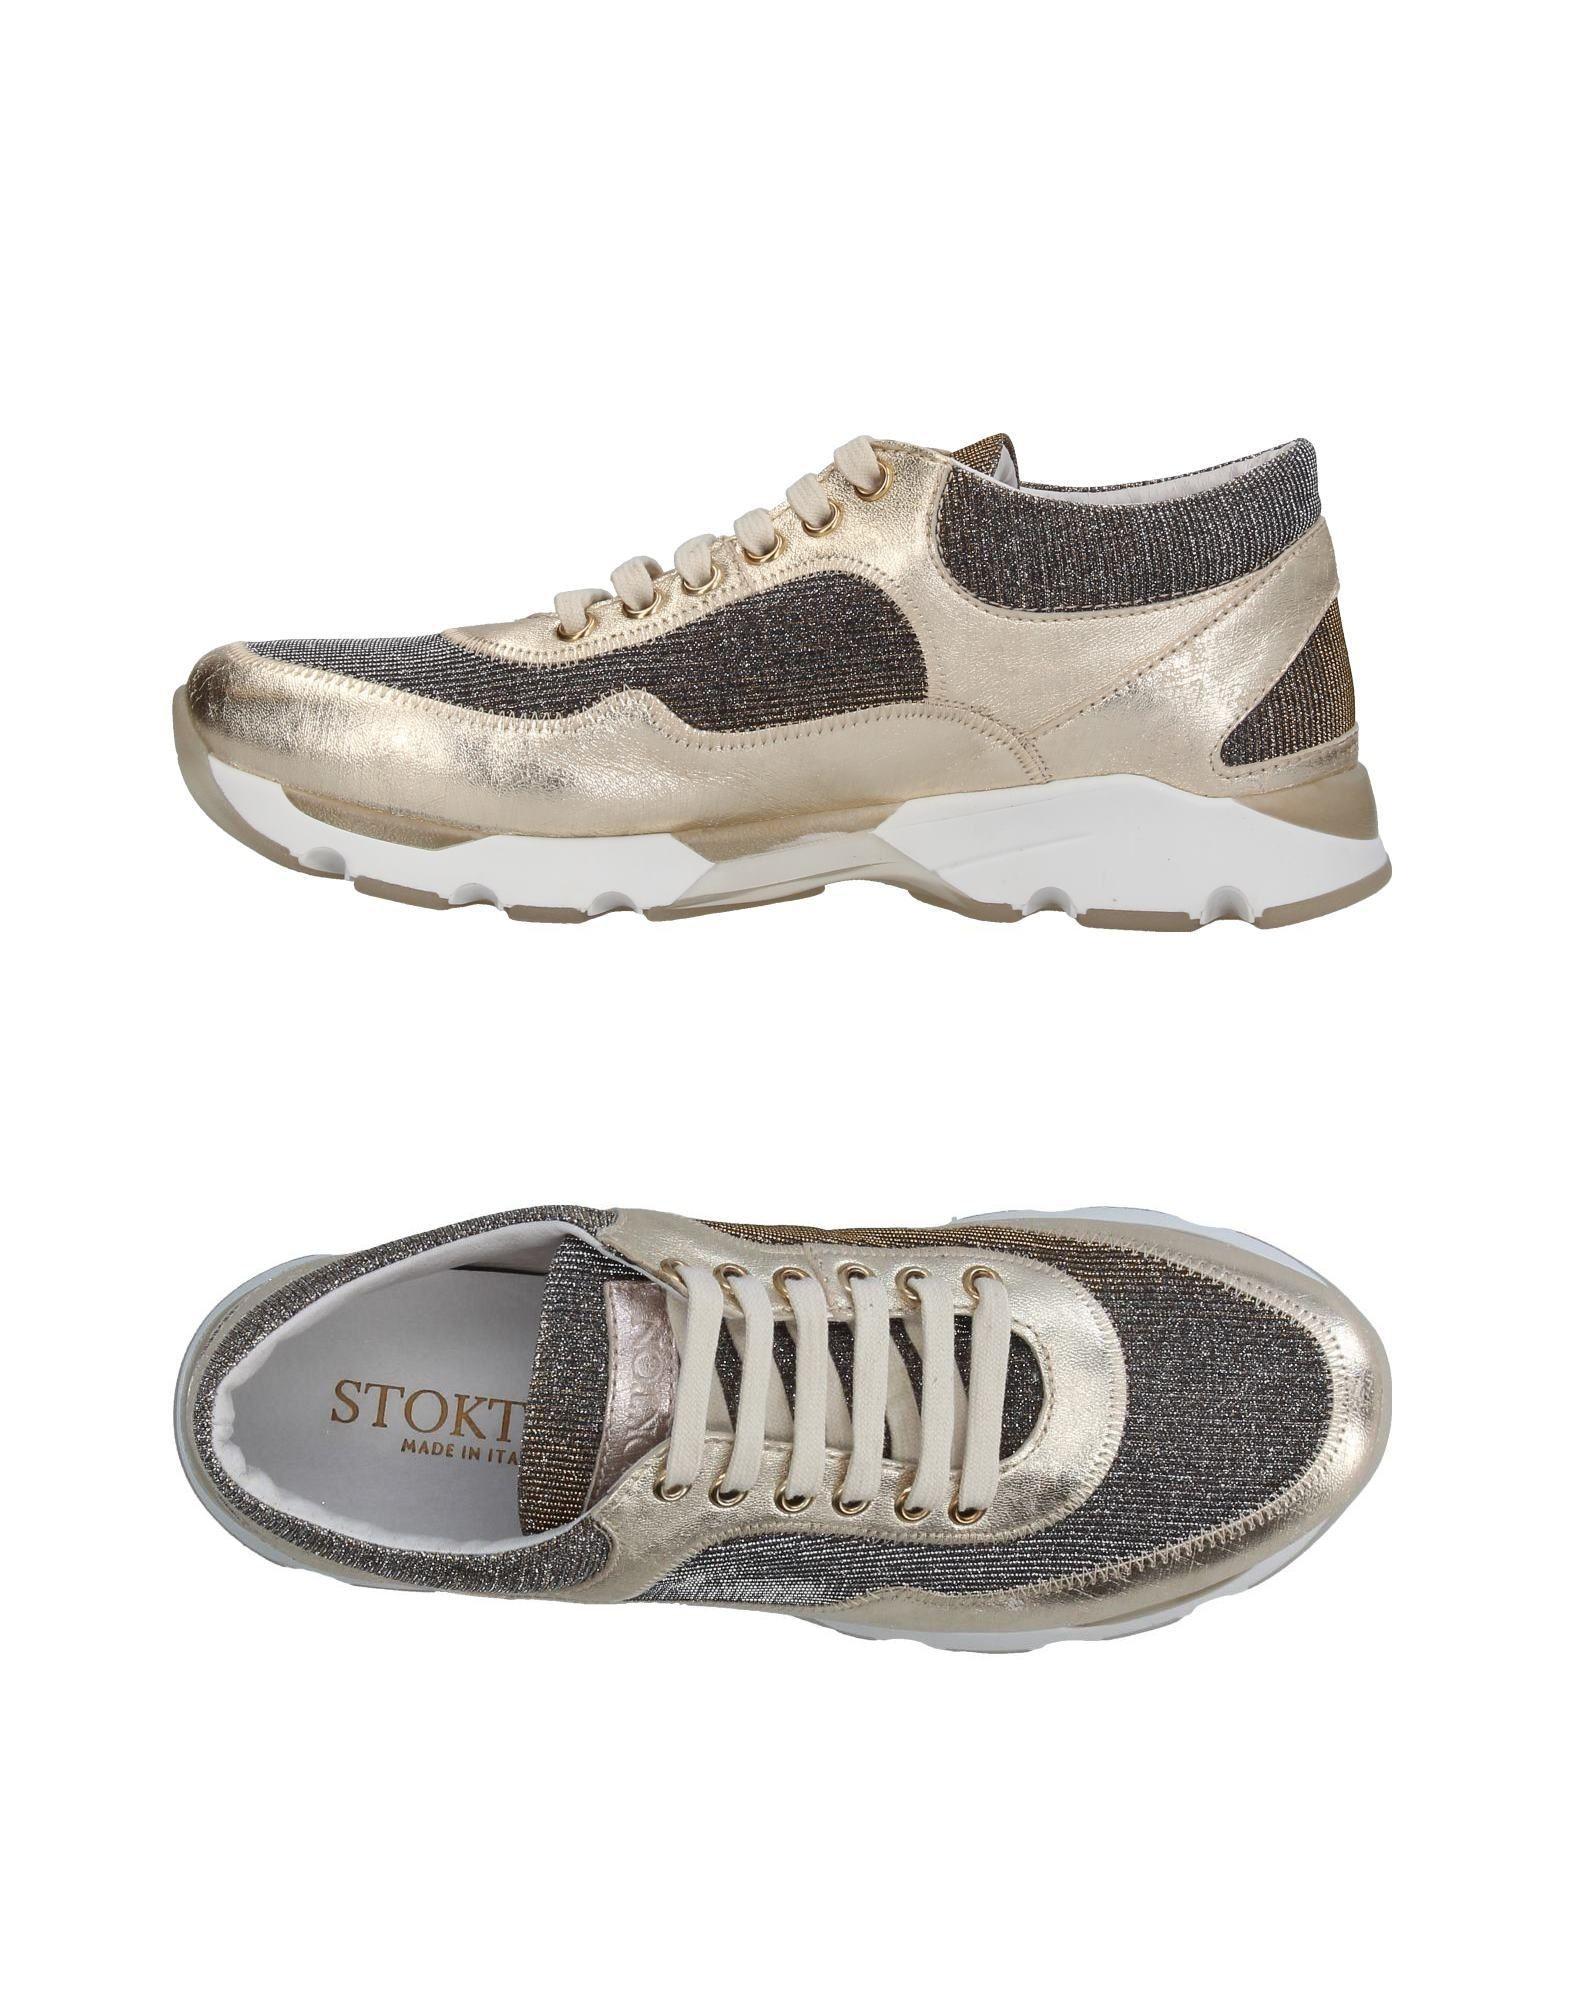 Stokton Sneakers Damen  11361444UX Gute Qualität beliebte Schuhe